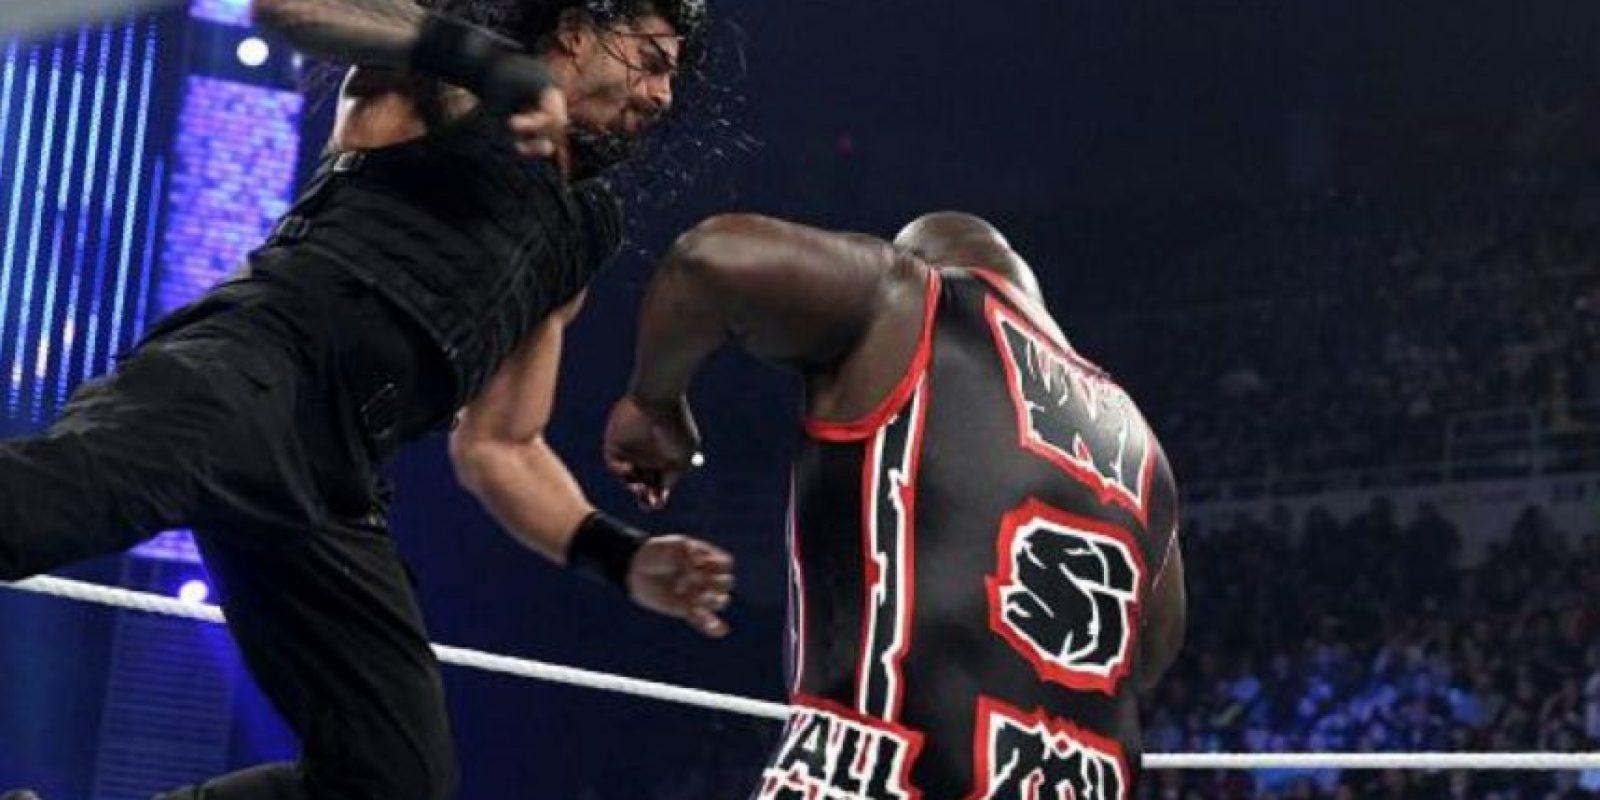 Su verdadero nombre es Joe Anoa'I Foto:WWE